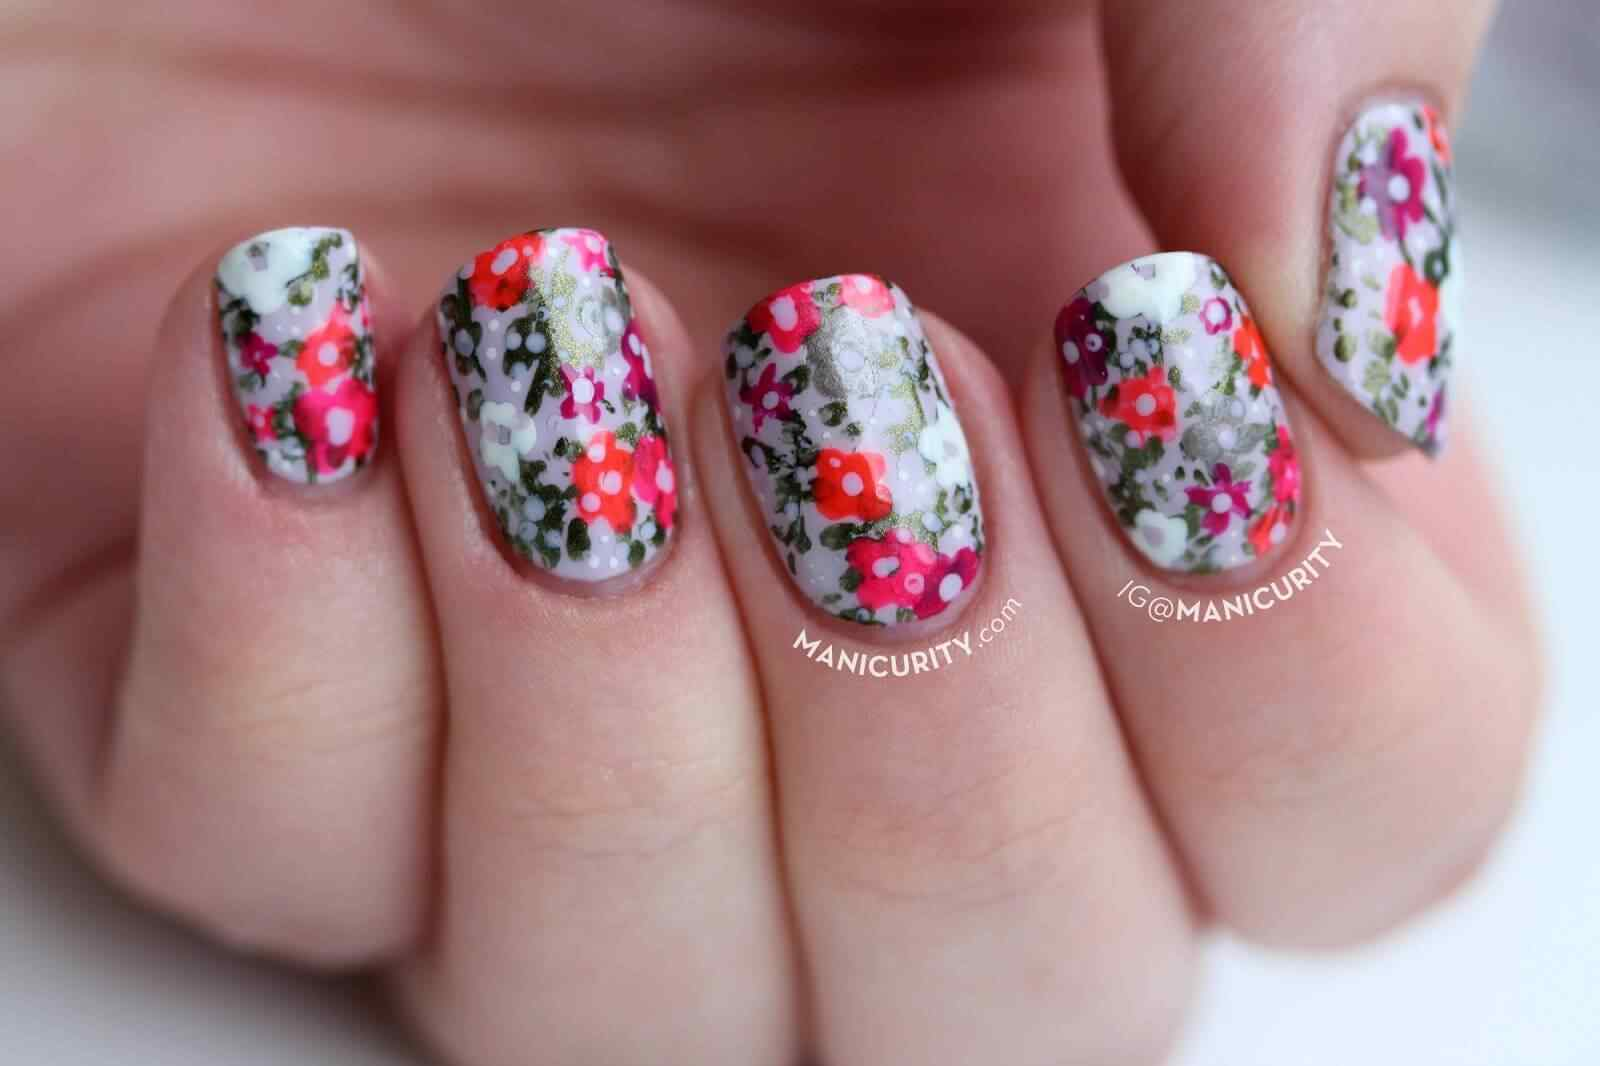 unas decoradas primavera (10)